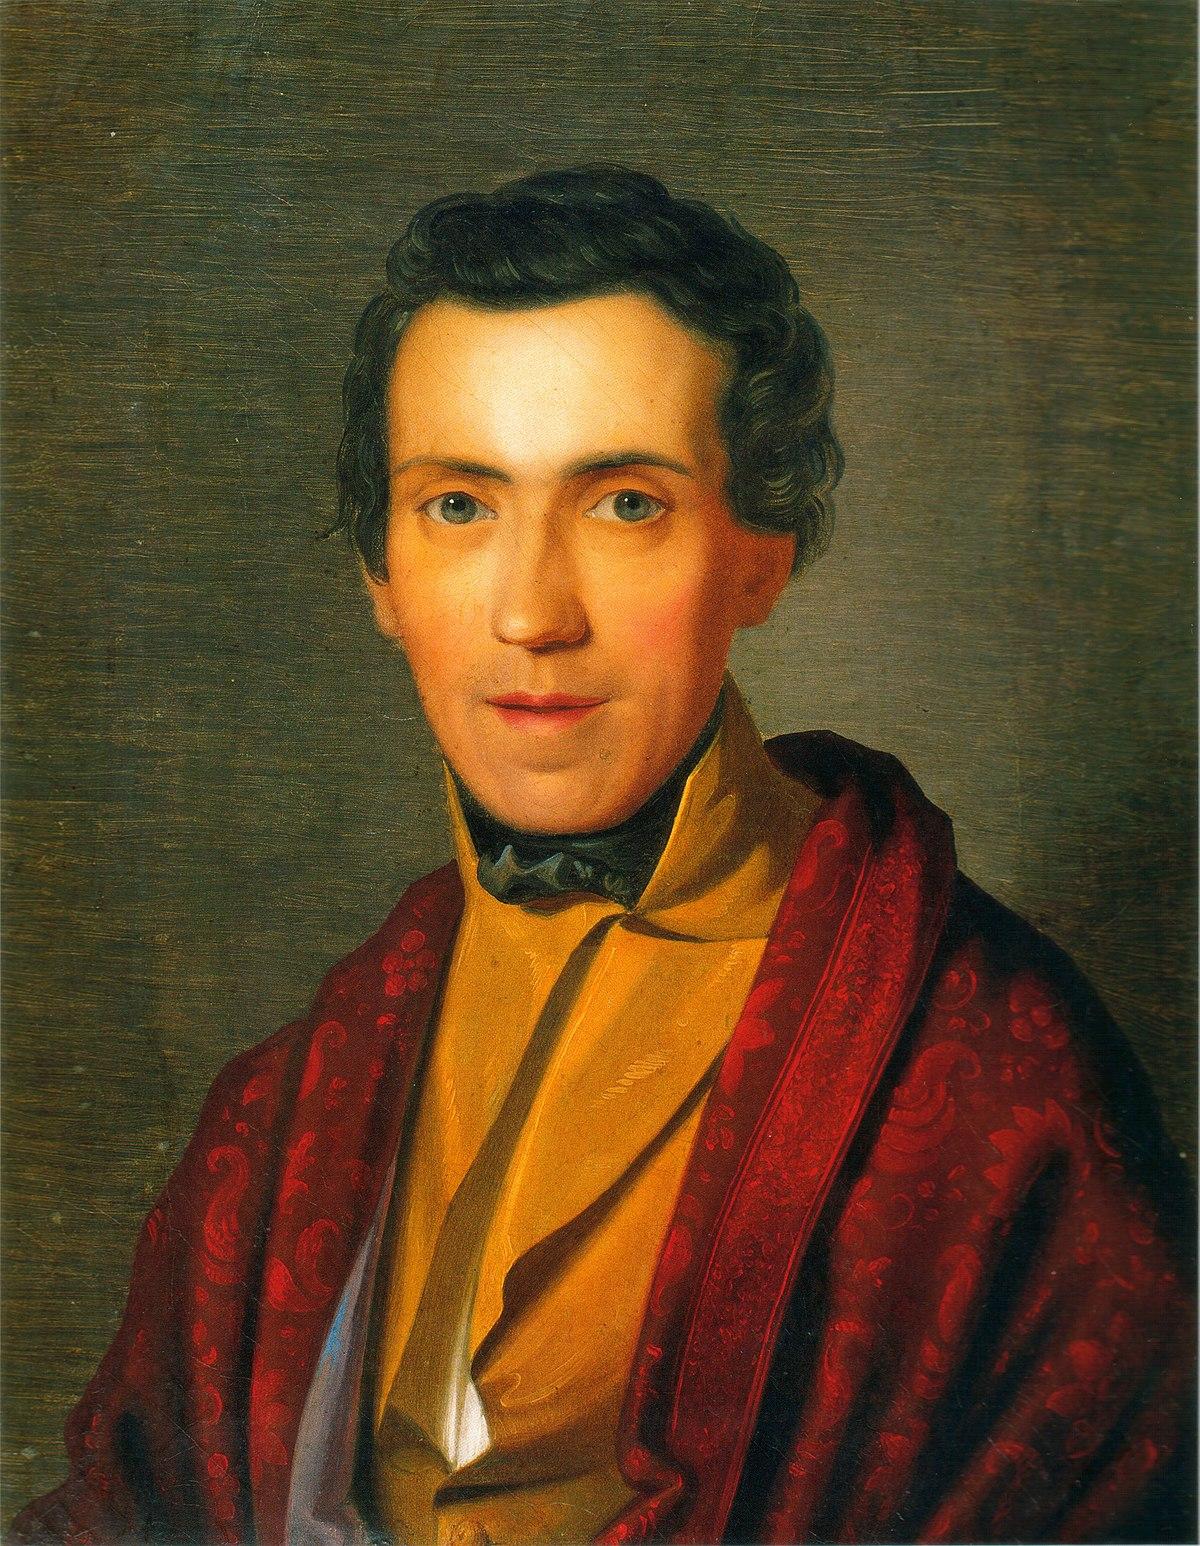 Adrian Ludwig Richter